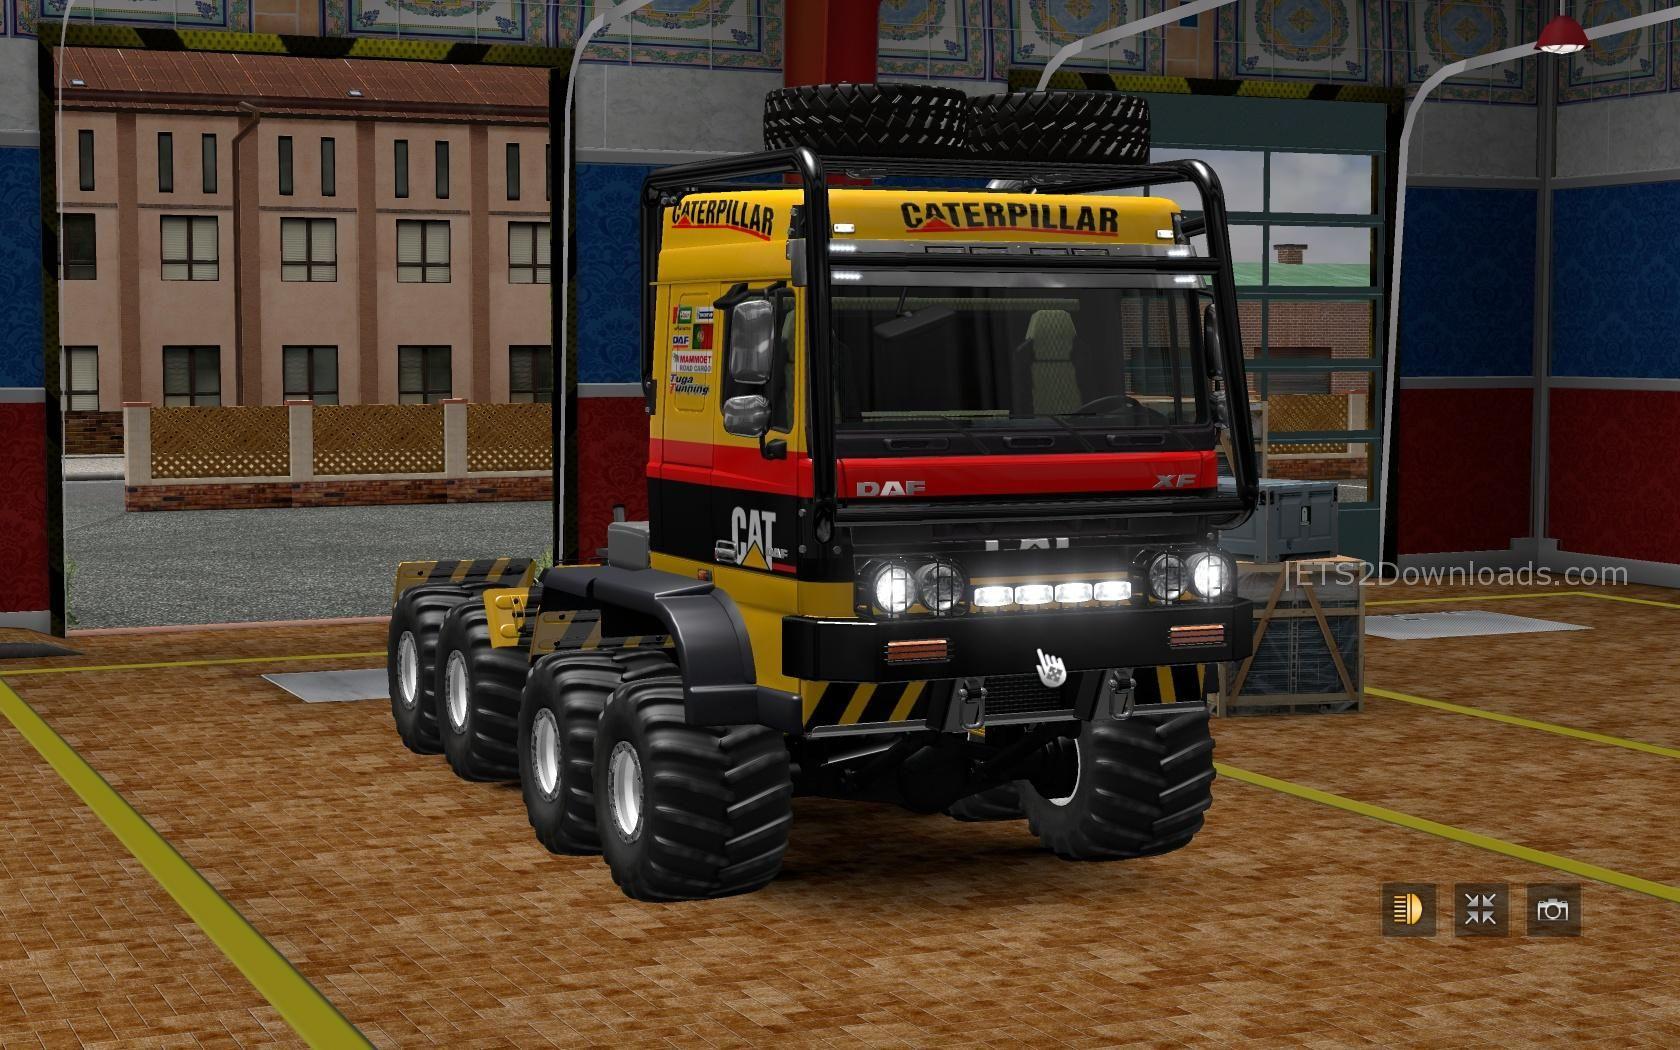 daf-crawler-4